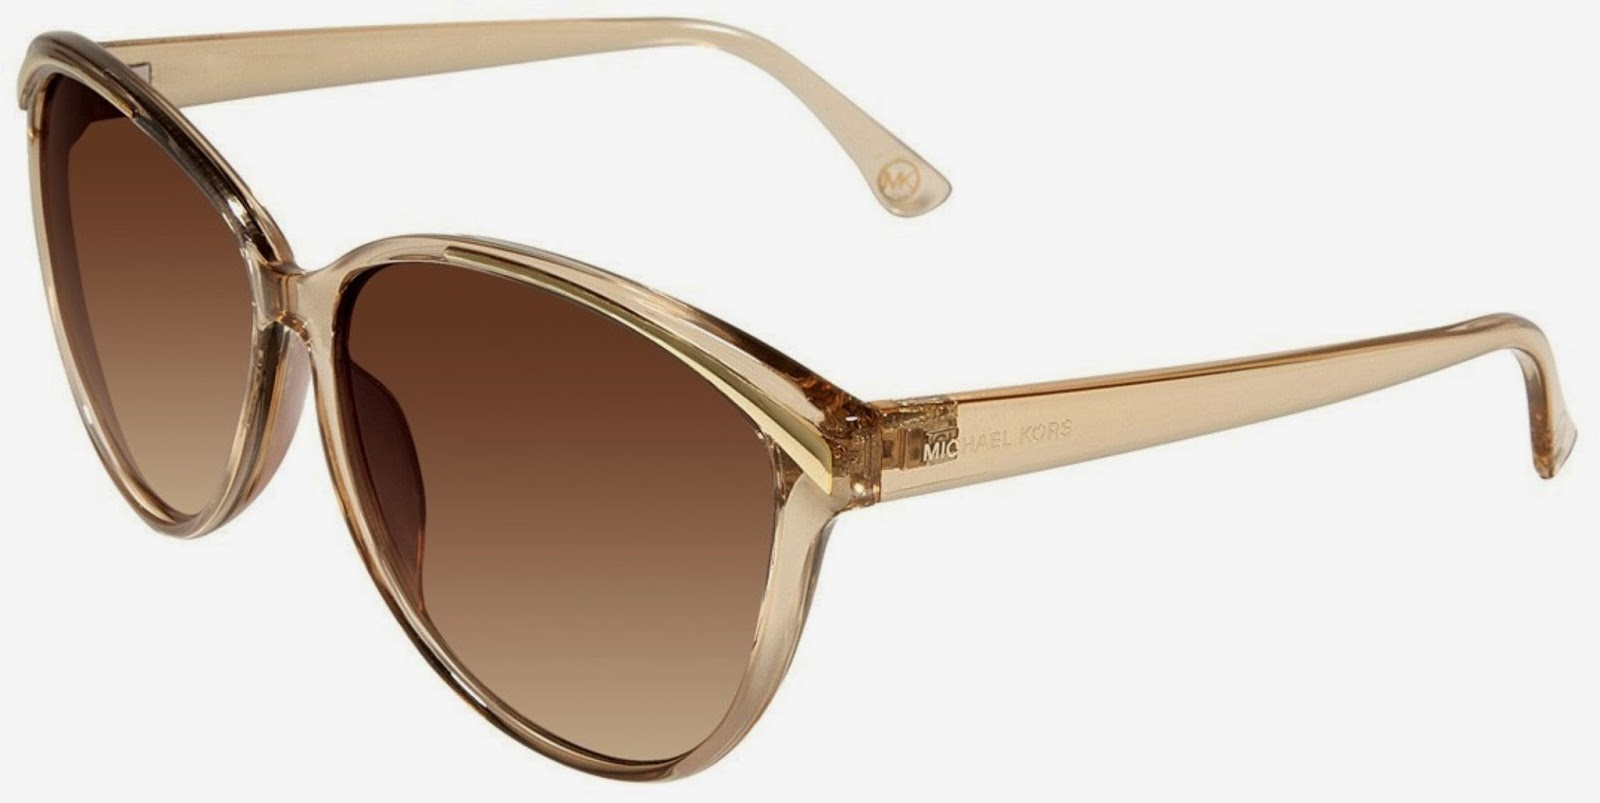 d6a49d2e199ba Em Contraluz  Michael Kors - oculos de sol e relógios fantásticos